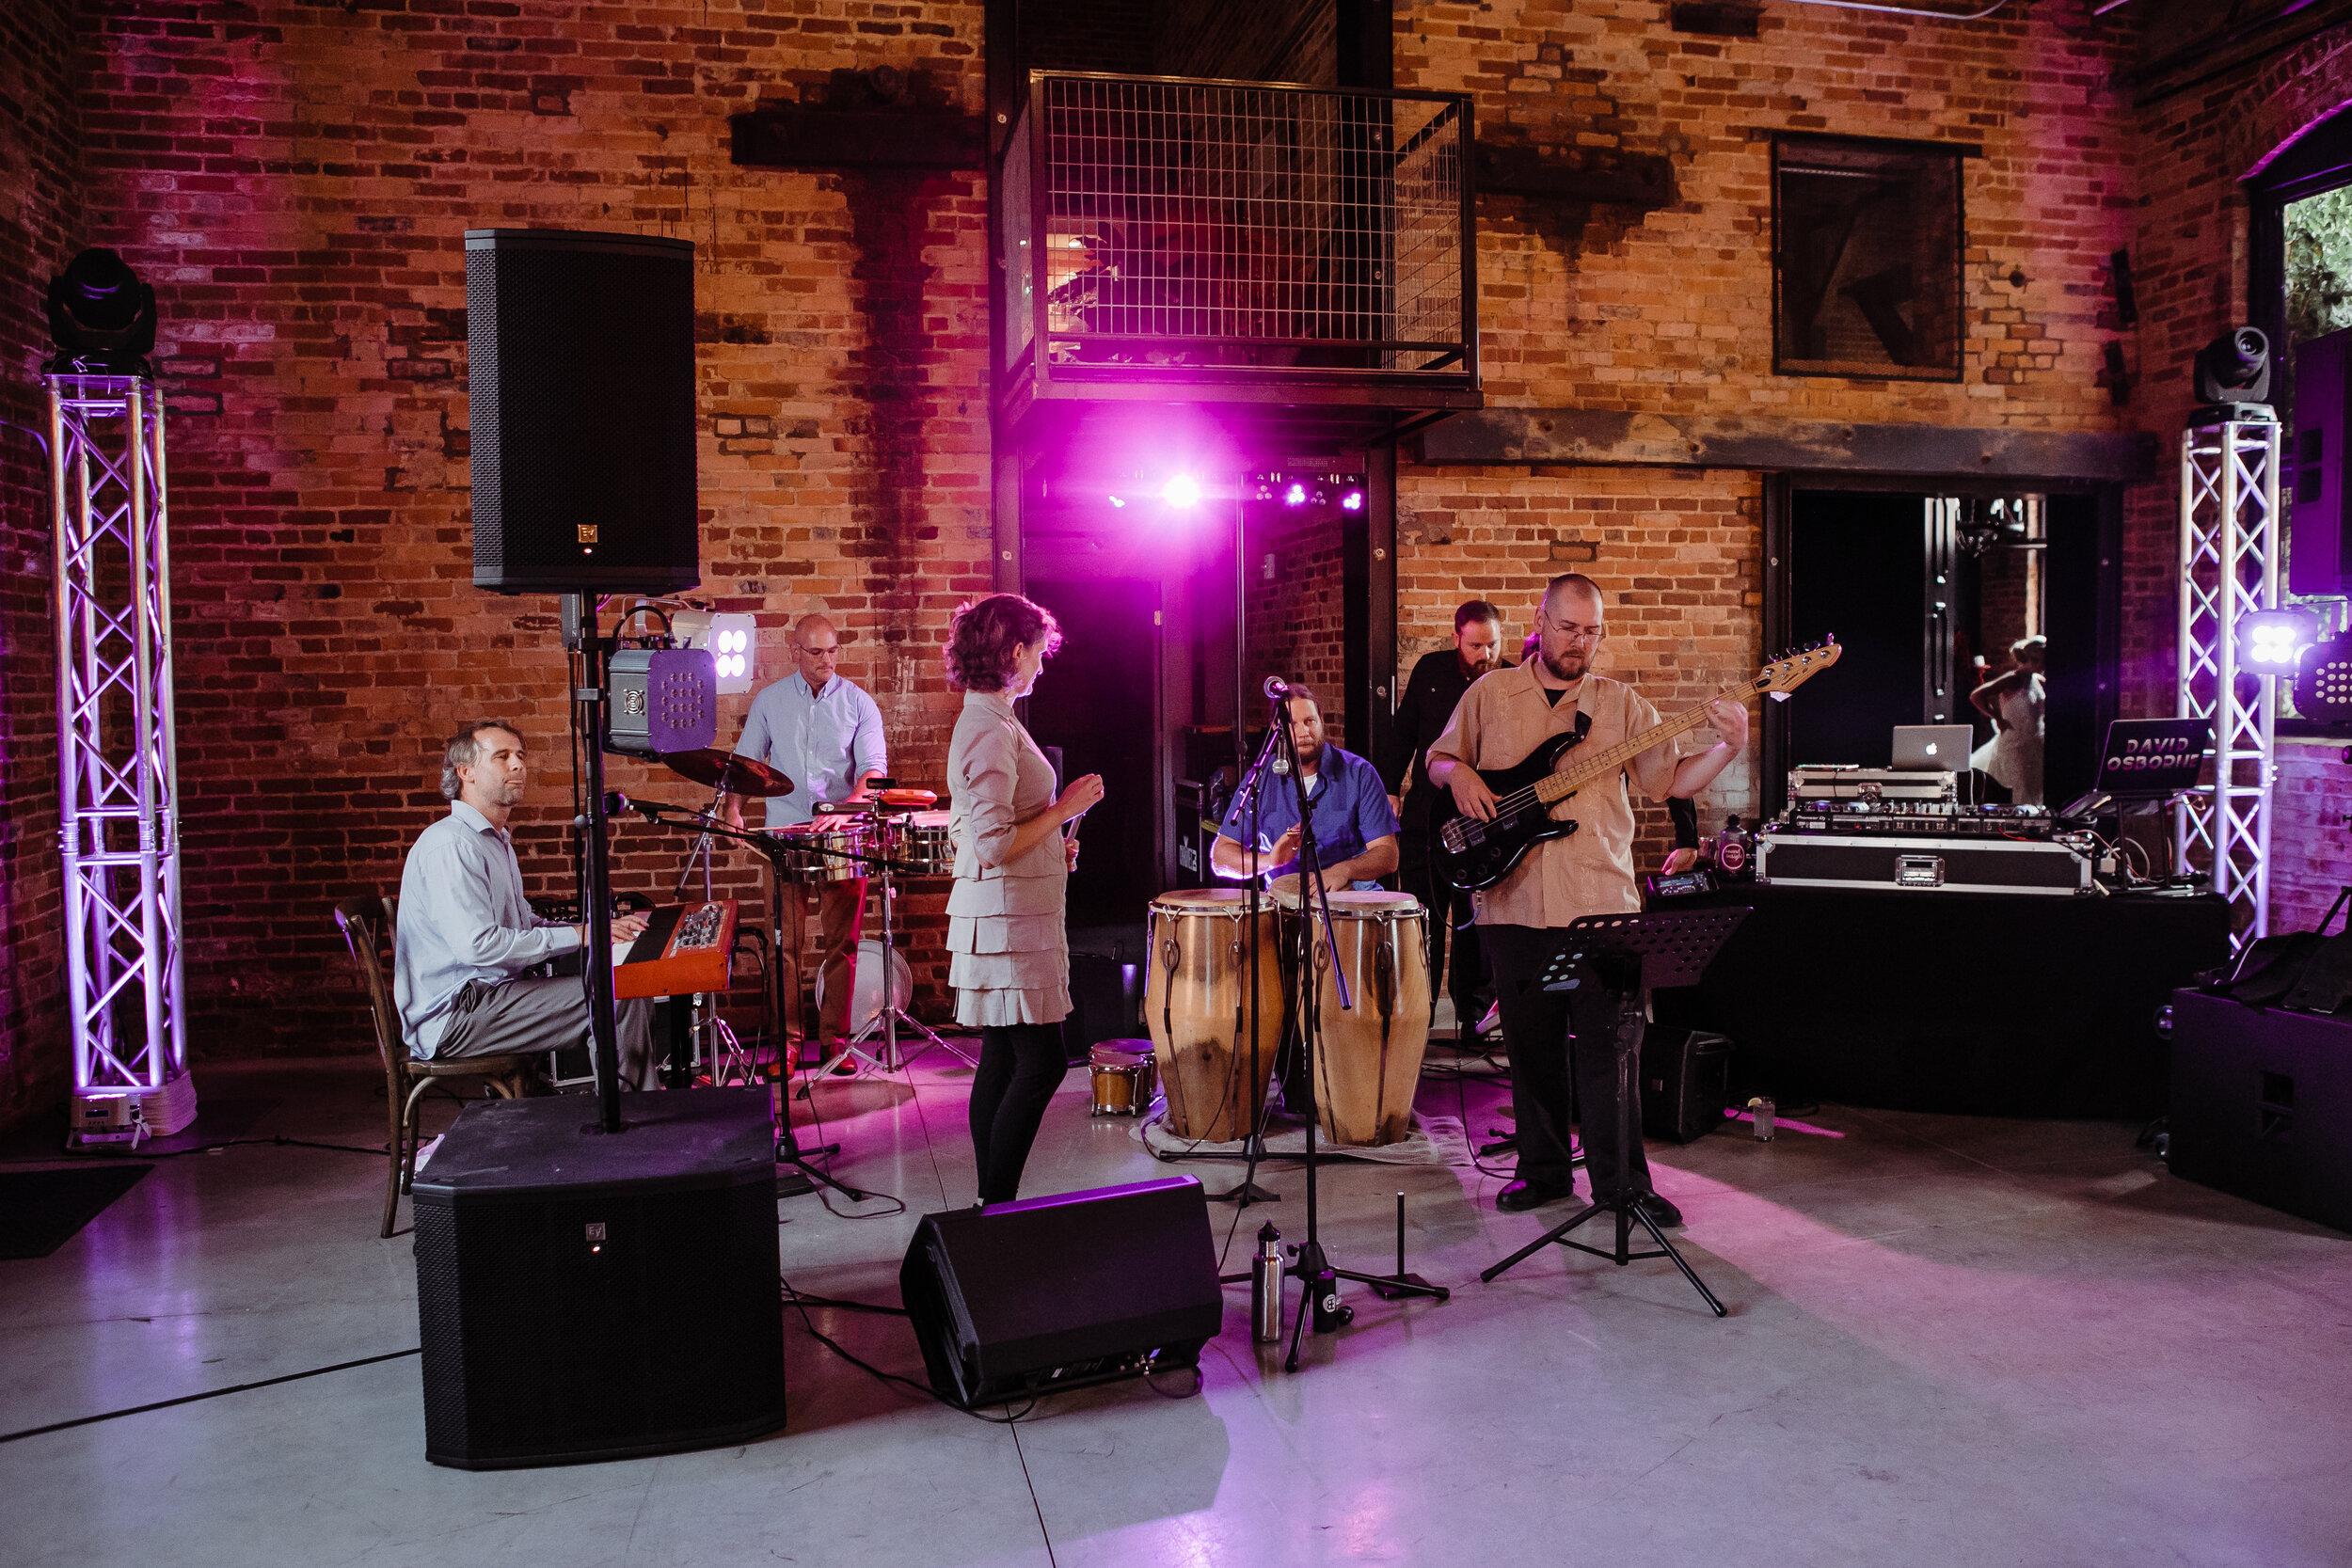 Nuevo Grogus Salsa Band  -  Kristin Benton Photography